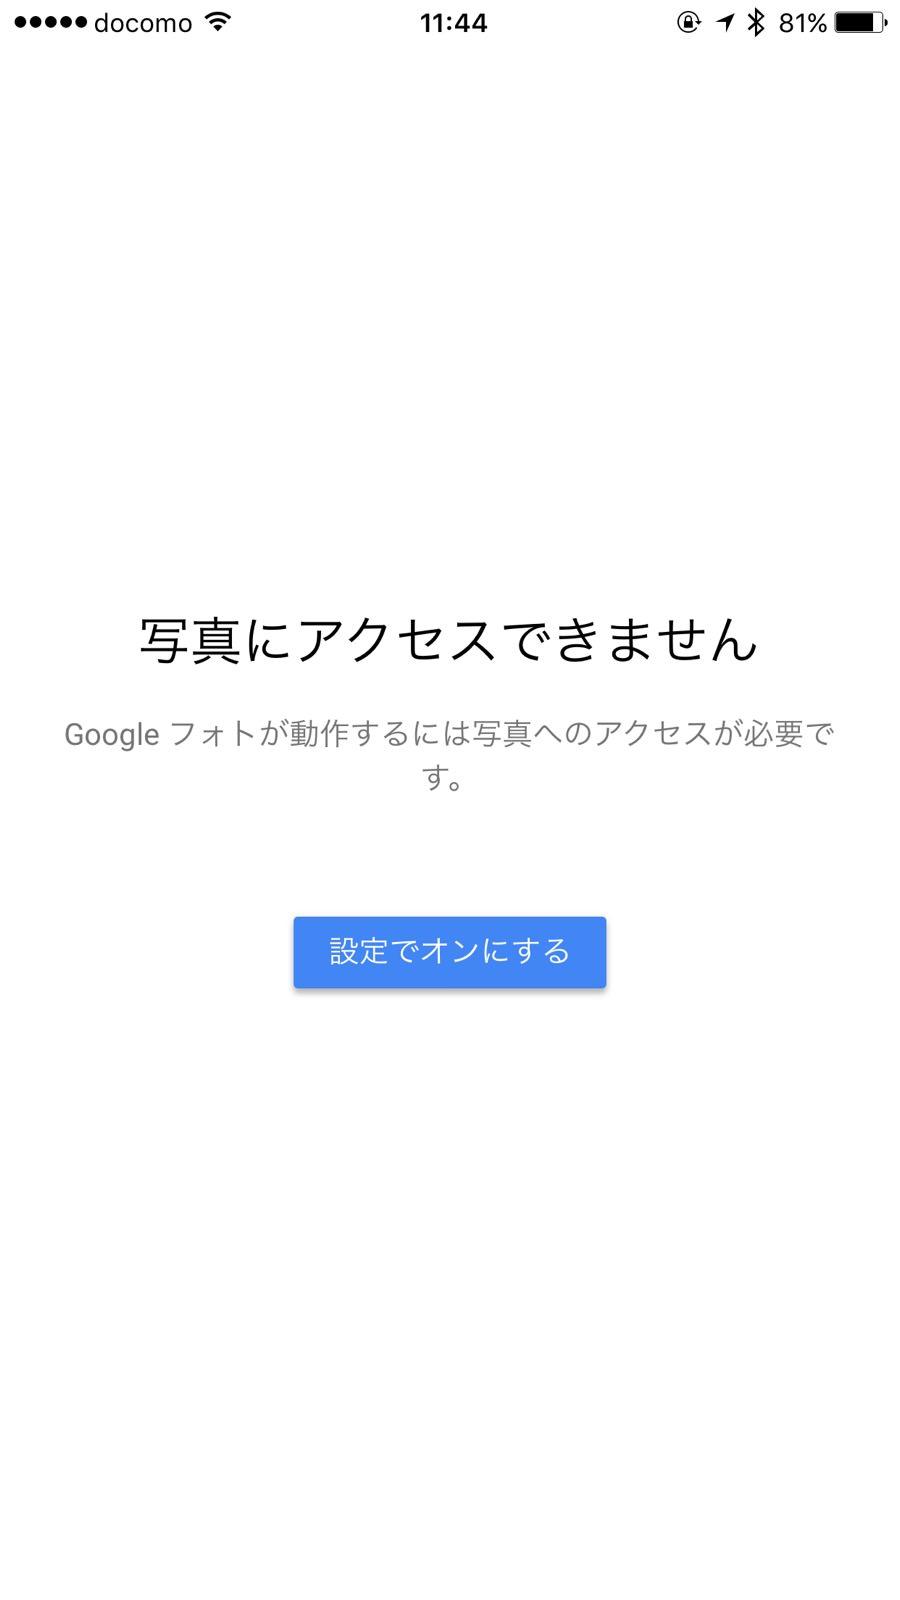 【Googleフォト】「写真にアクセスできません」と表示された時の対処方法